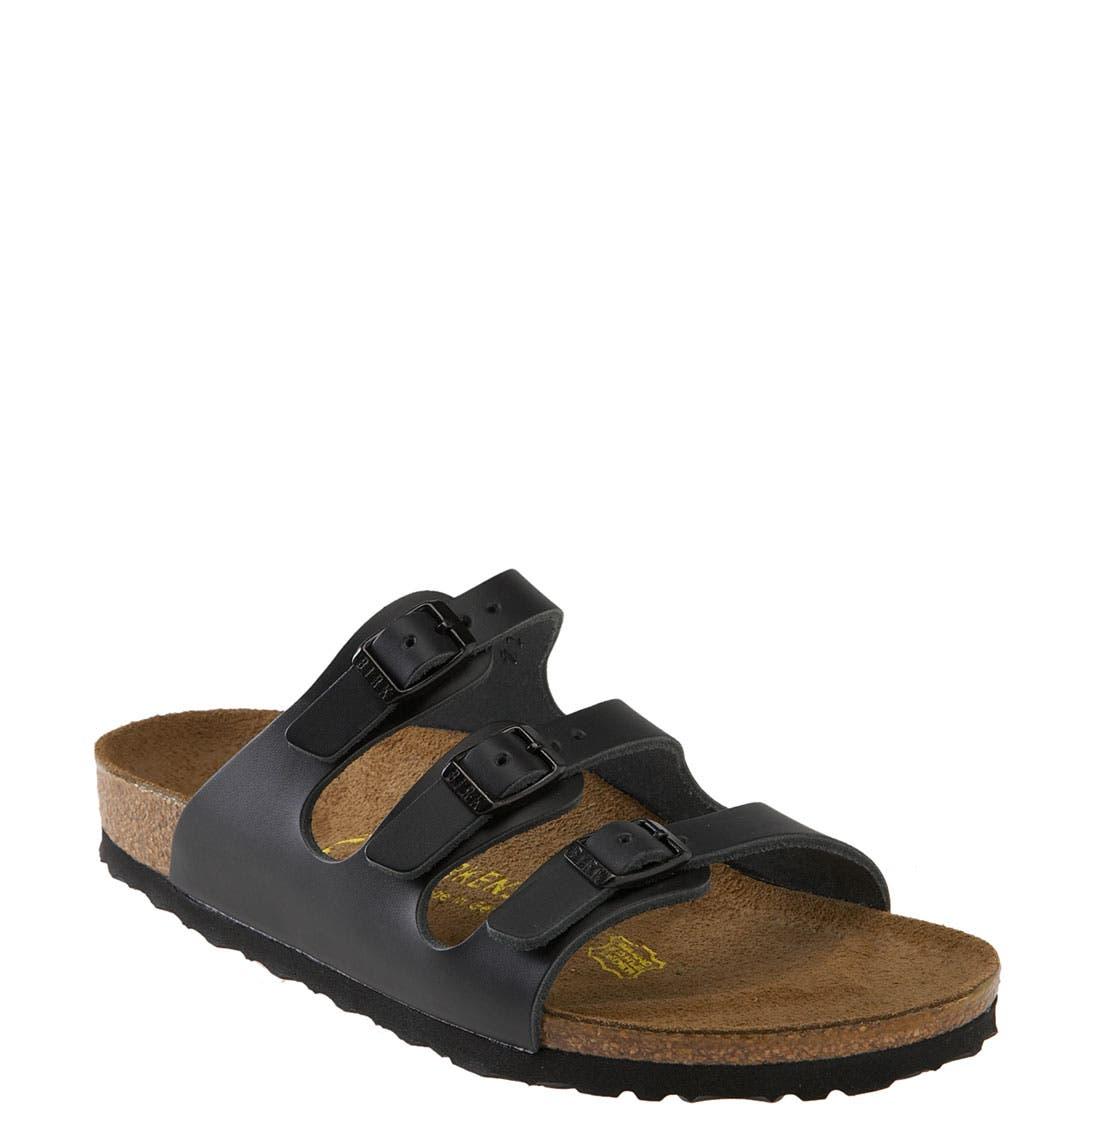 BIRKENSTOCK 'Florida' Sandal, Main, color, 001